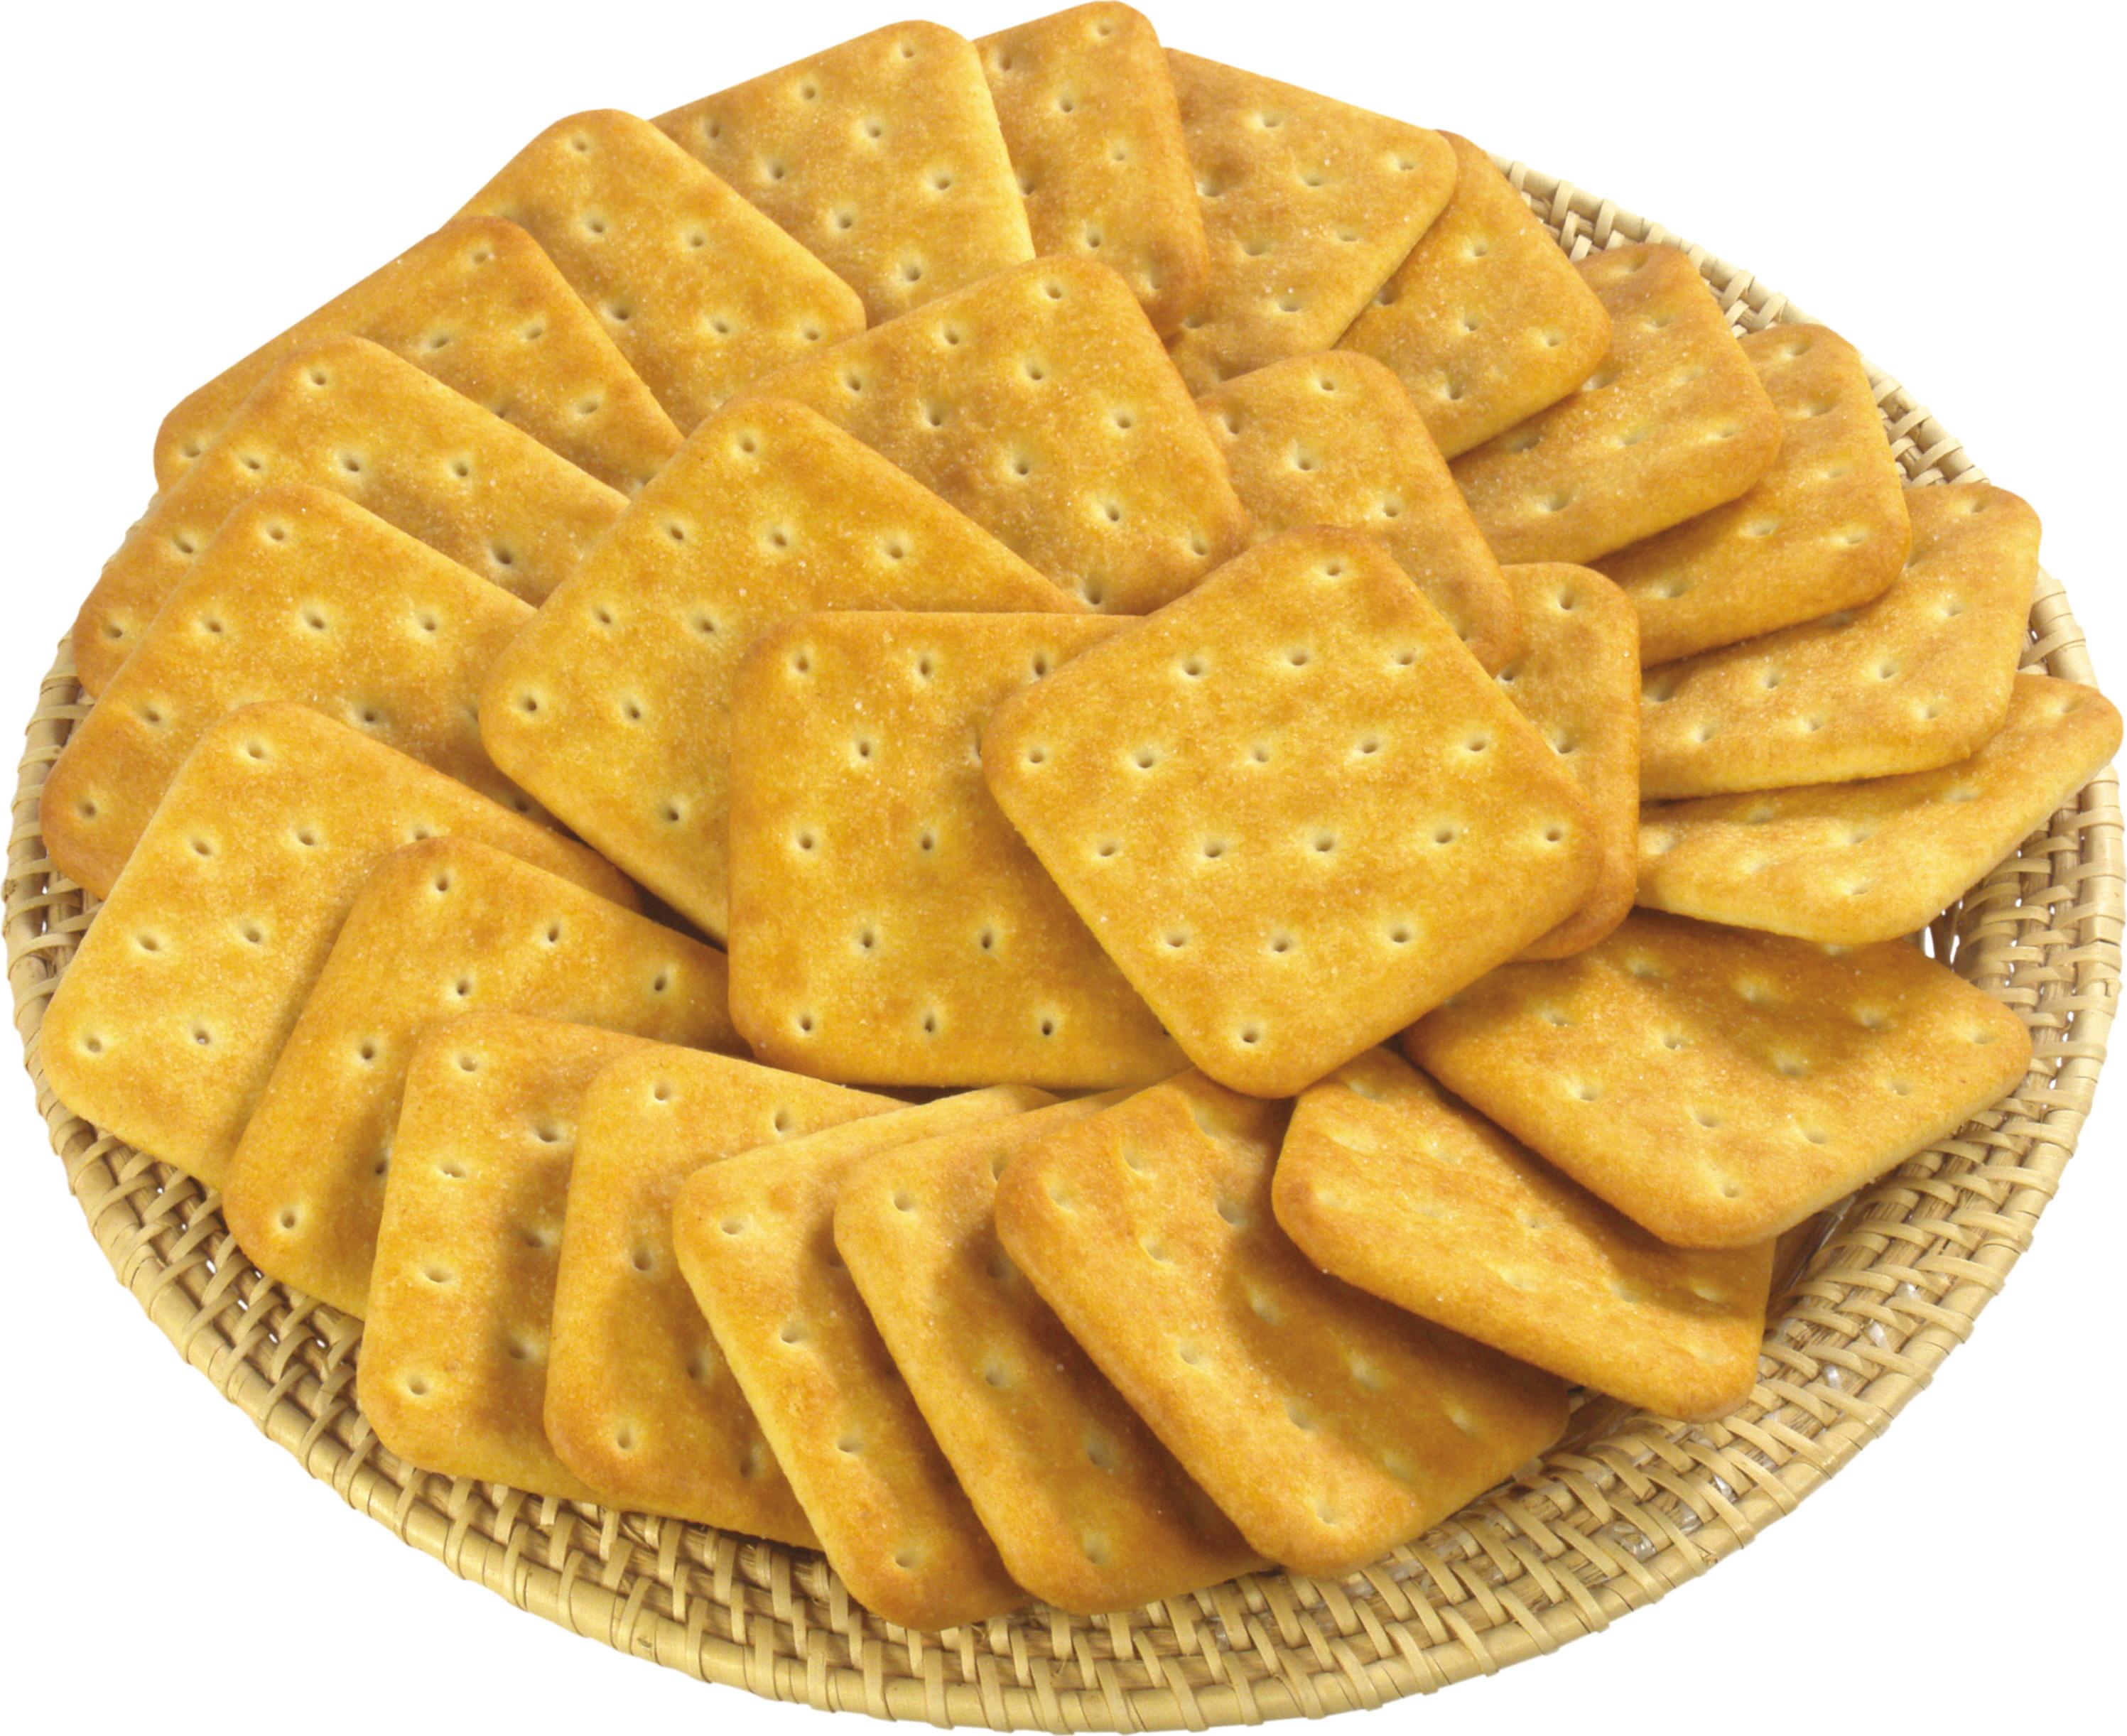 Snacks PNG Image.